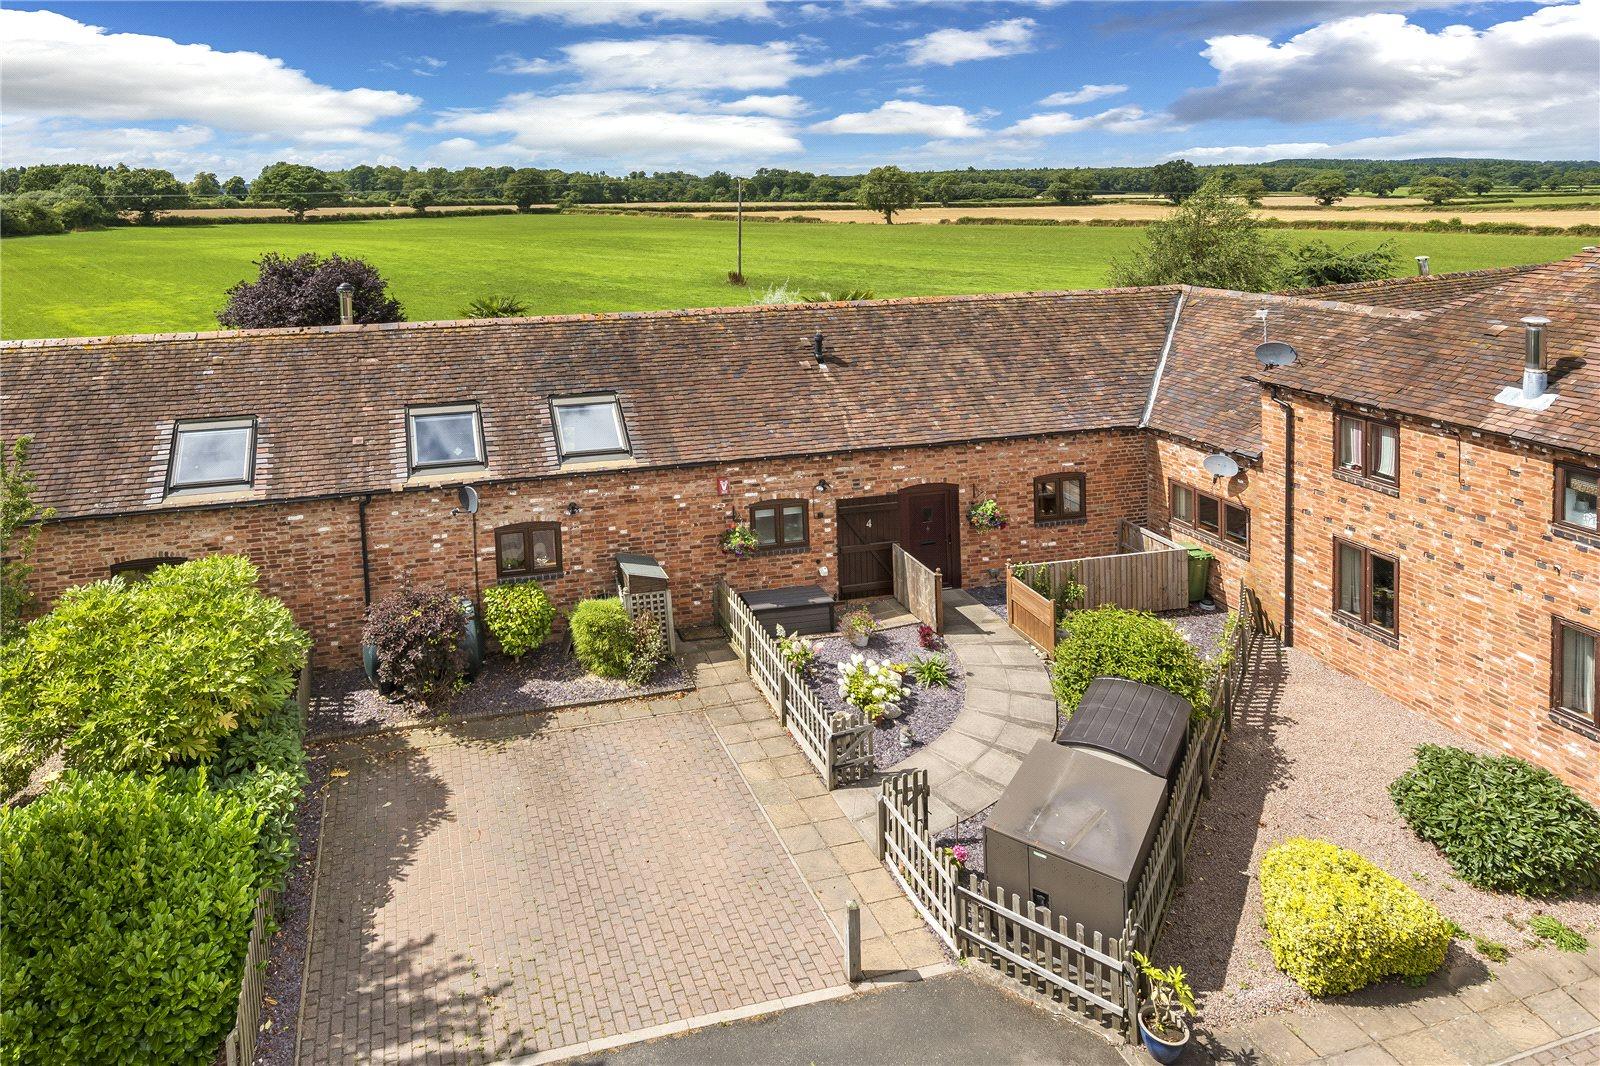 Sycamore Cottage, 4 Beighterton Farm Barns, Weston-under-Lizard, Shifnal, Staffordshire, TF11